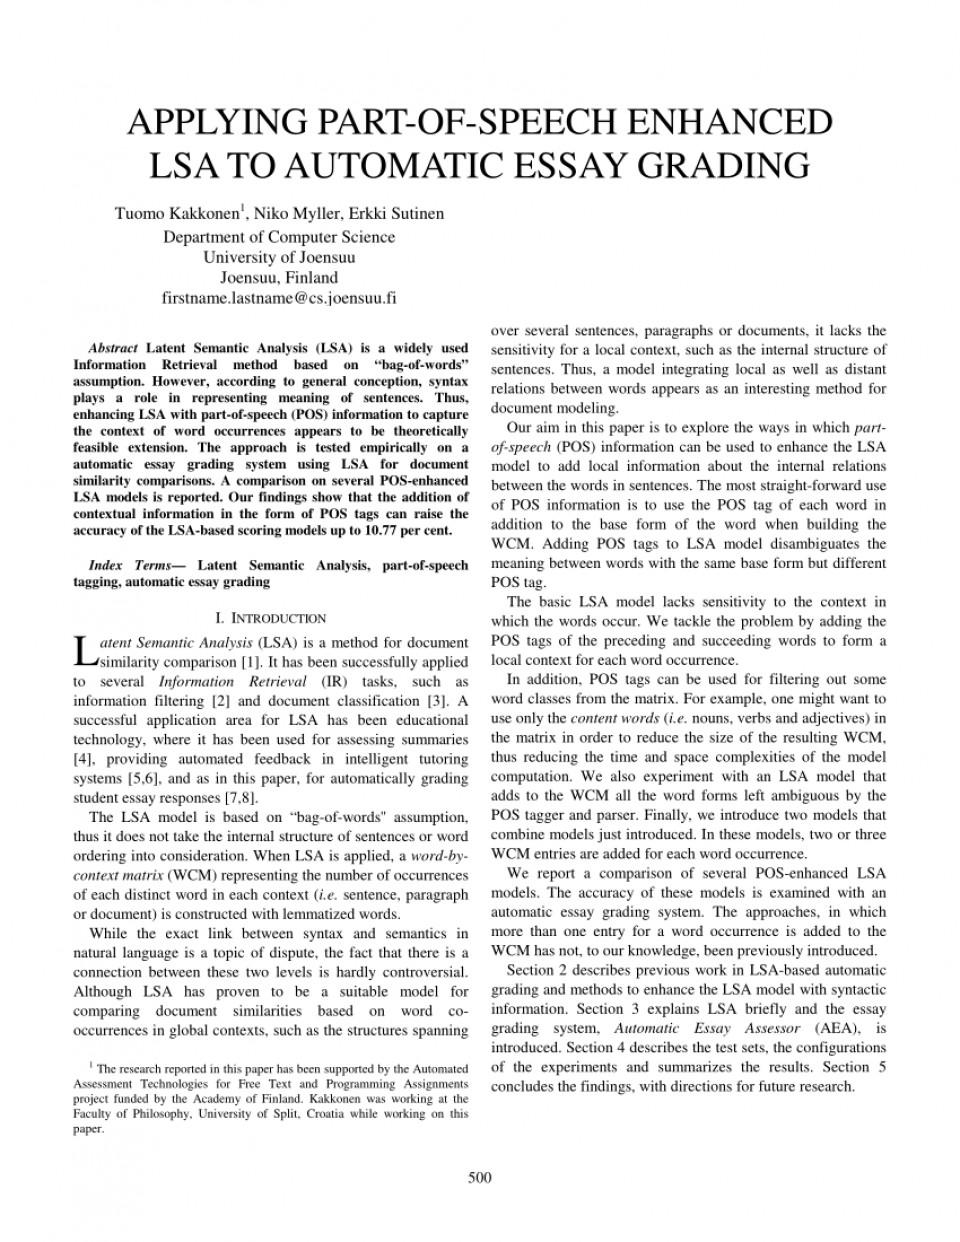 007 Automatic Essay Grader Free Example Singular 960